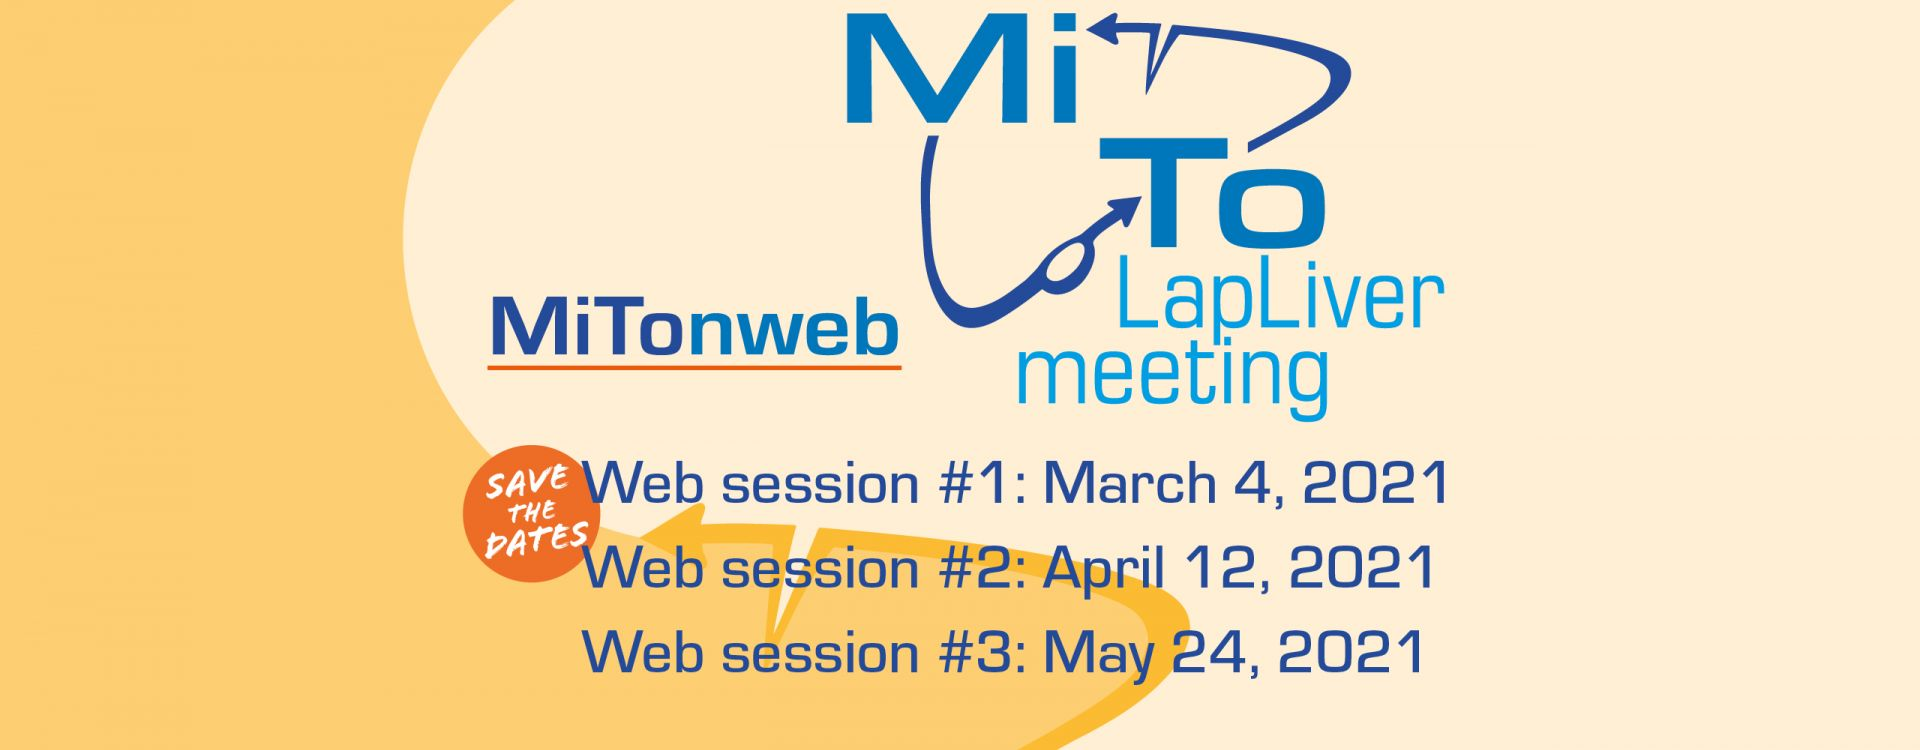 MITO LapLiver Meeting